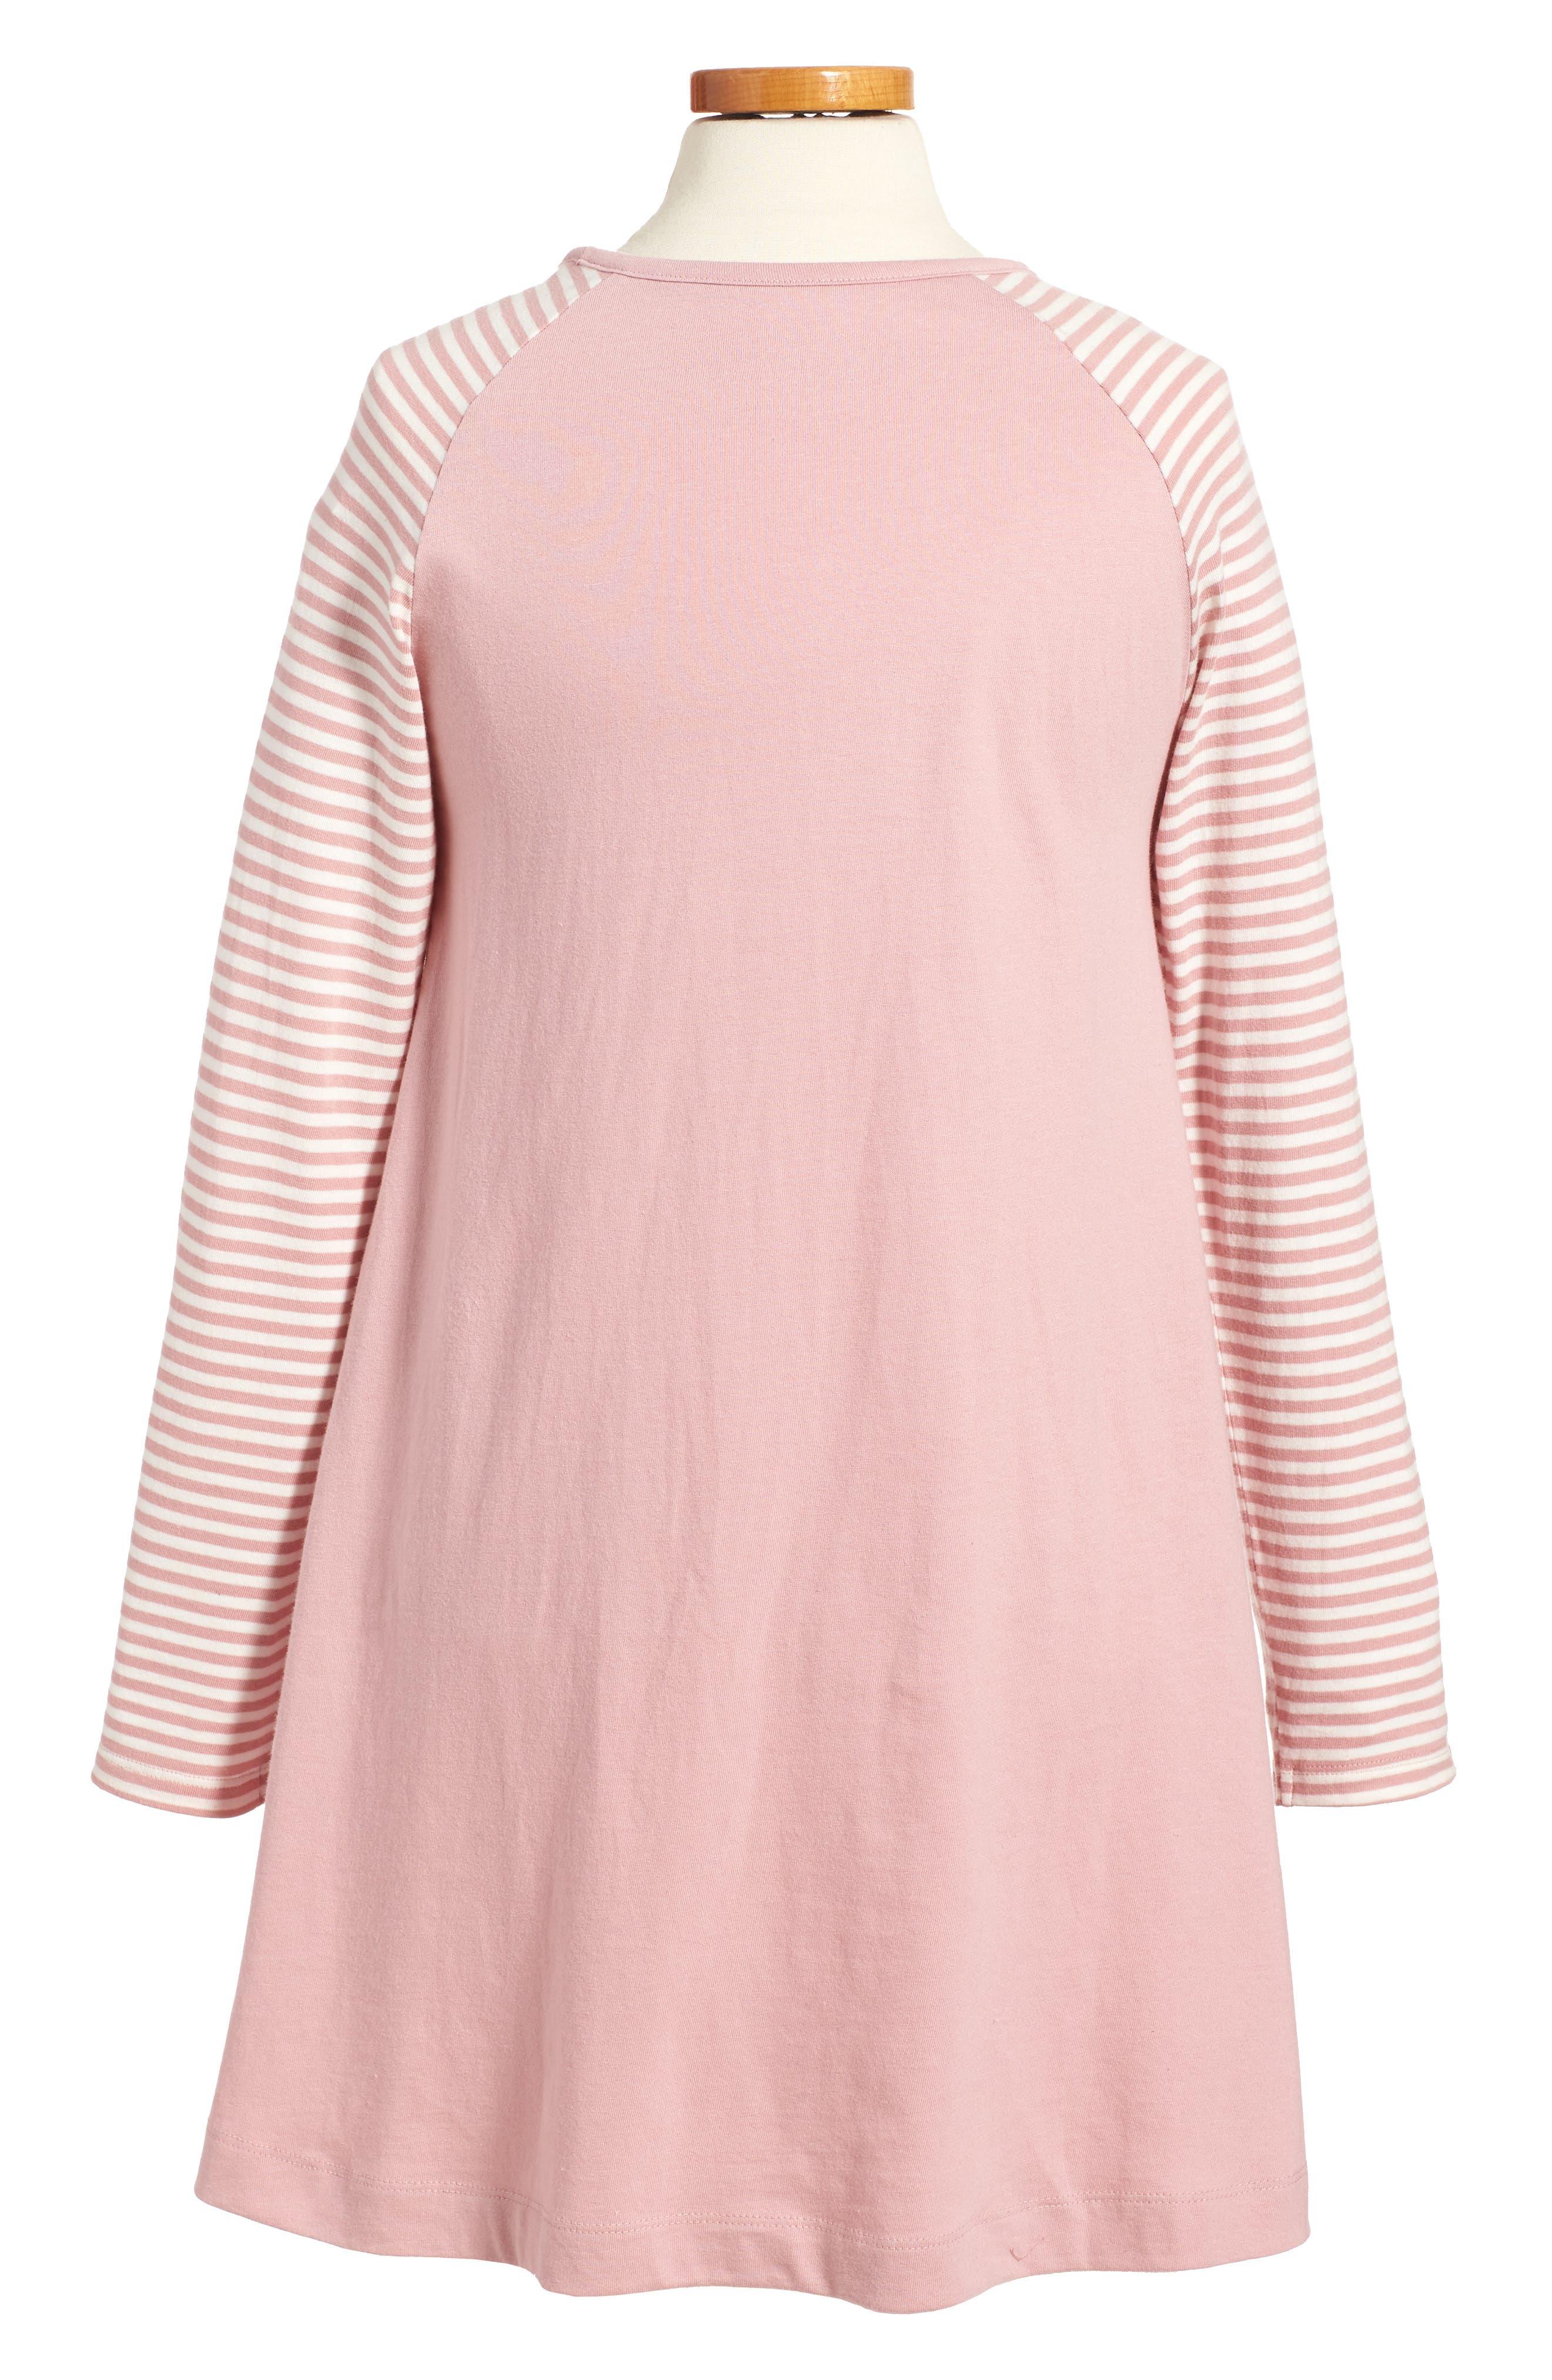 Alternate Image 2  - Mini Boden Big Appliqué Jersey Dress (Toddler Girls, Little Girls & Big Girls)